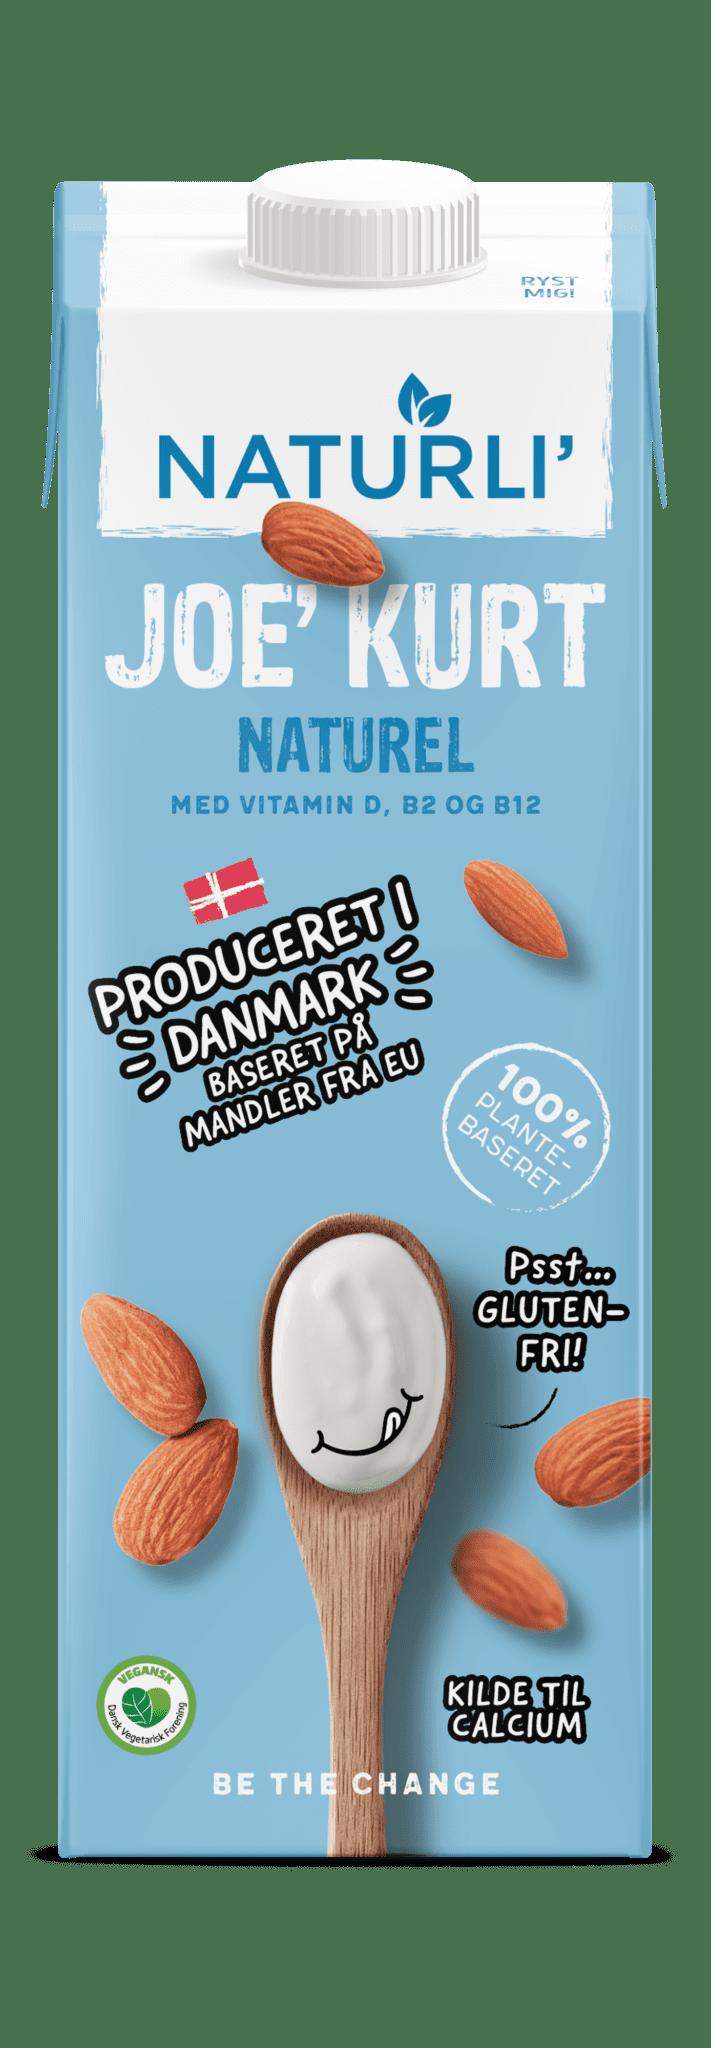 JOE' KURT naturel | vegansk yoghurt alternativ